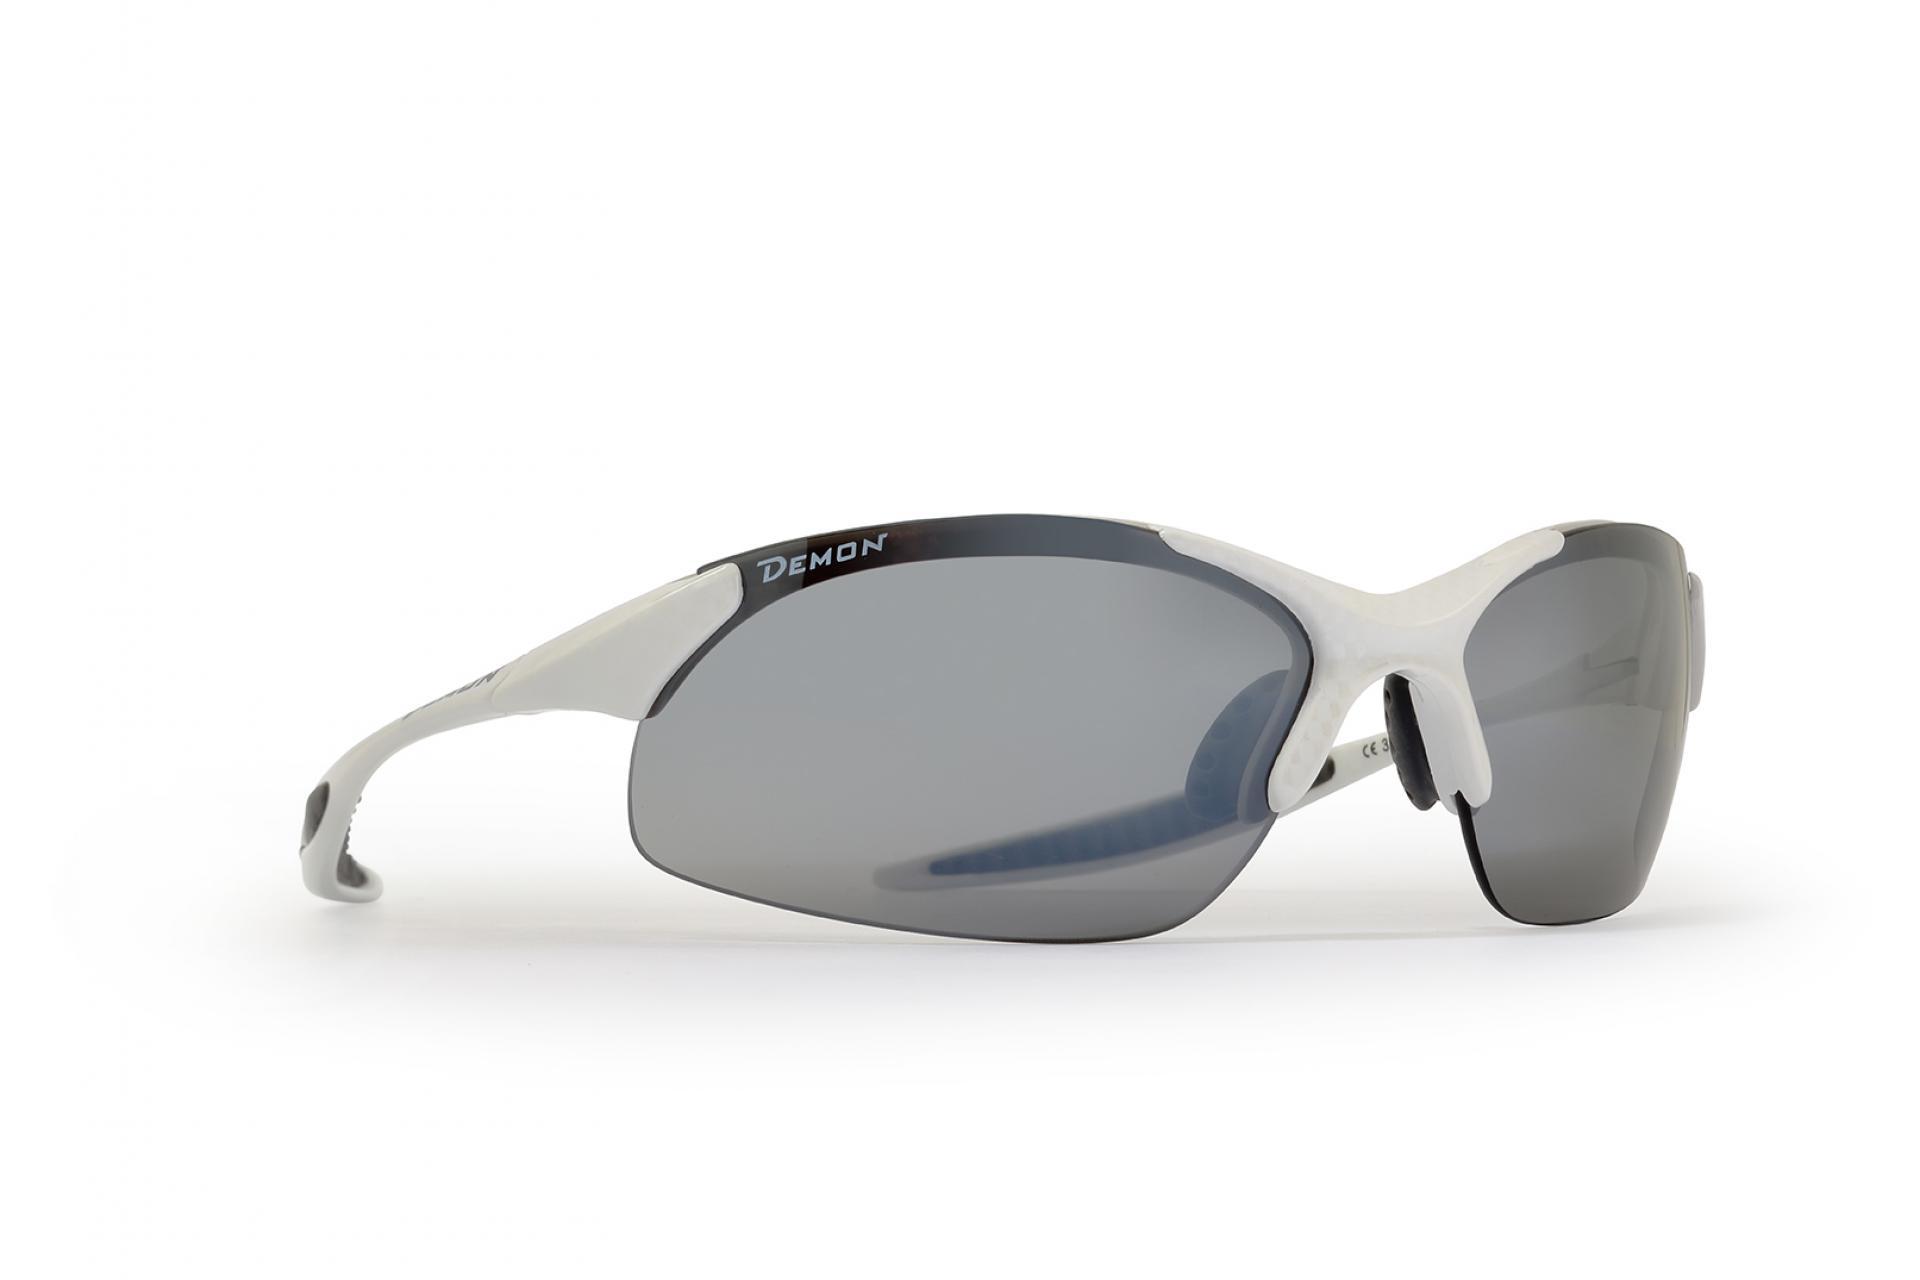 Demon 832 Cykelbriller Carbonhvid | Glasses